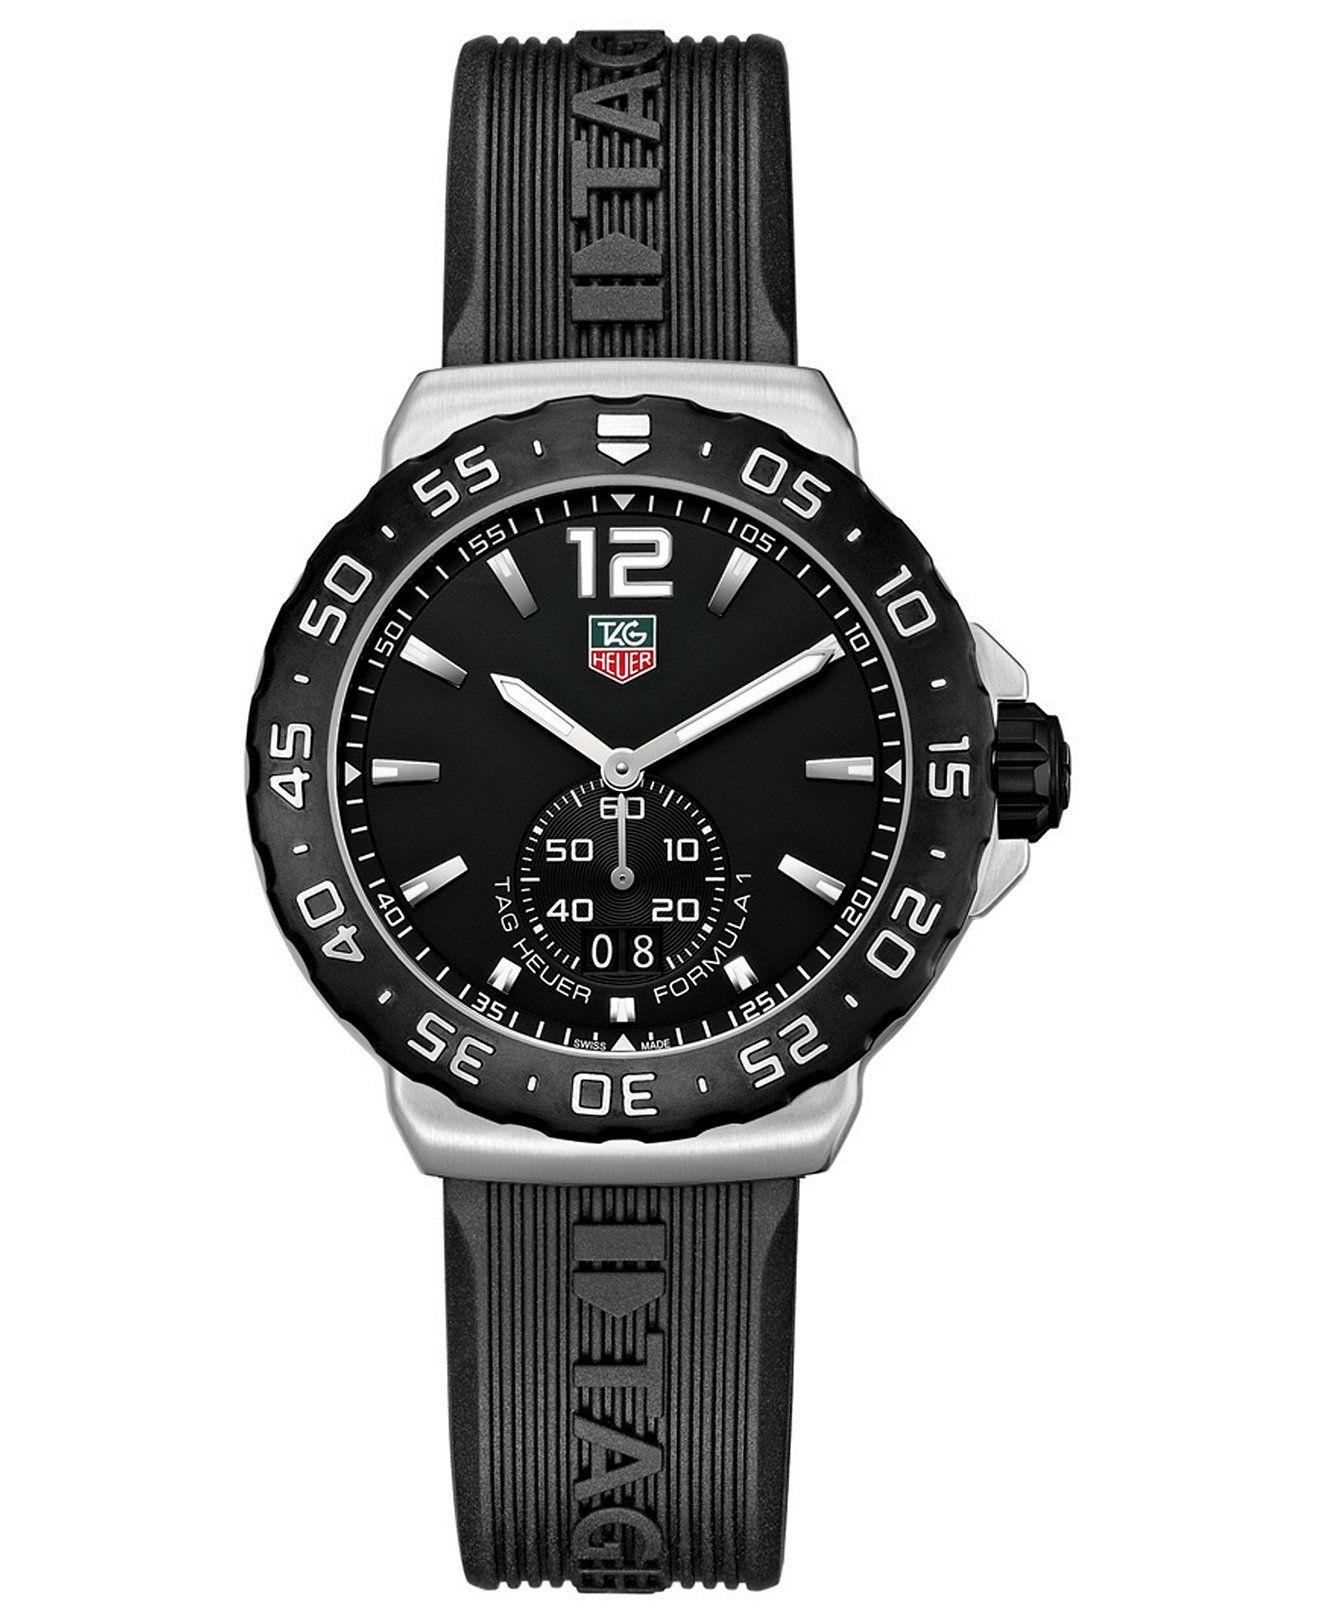 56b87b99bdf4 TAG Heuer Men s Swiss Formula 1 Black Rubber Strap Watch 42mm  WAU1110.FT6024 - TAG Heuer - Jewelry   Watches - Macy s